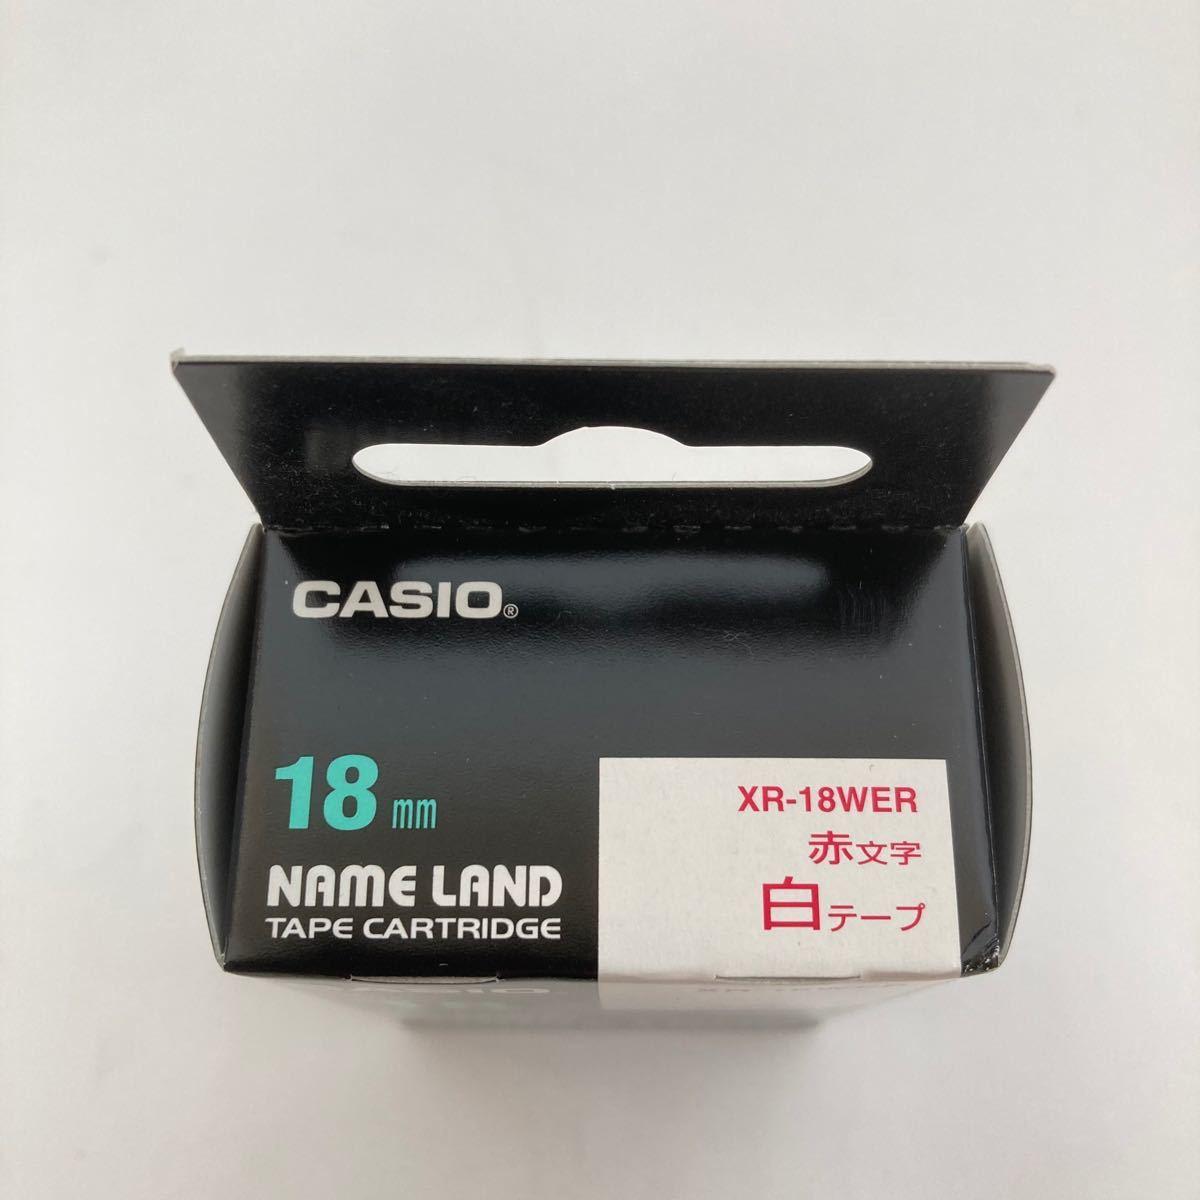 CASIO カシオ ネームランド ラベルライター 純正 テープ 18mm XR-18WER 白地に赤文字【新品即出荷、送料込!!】